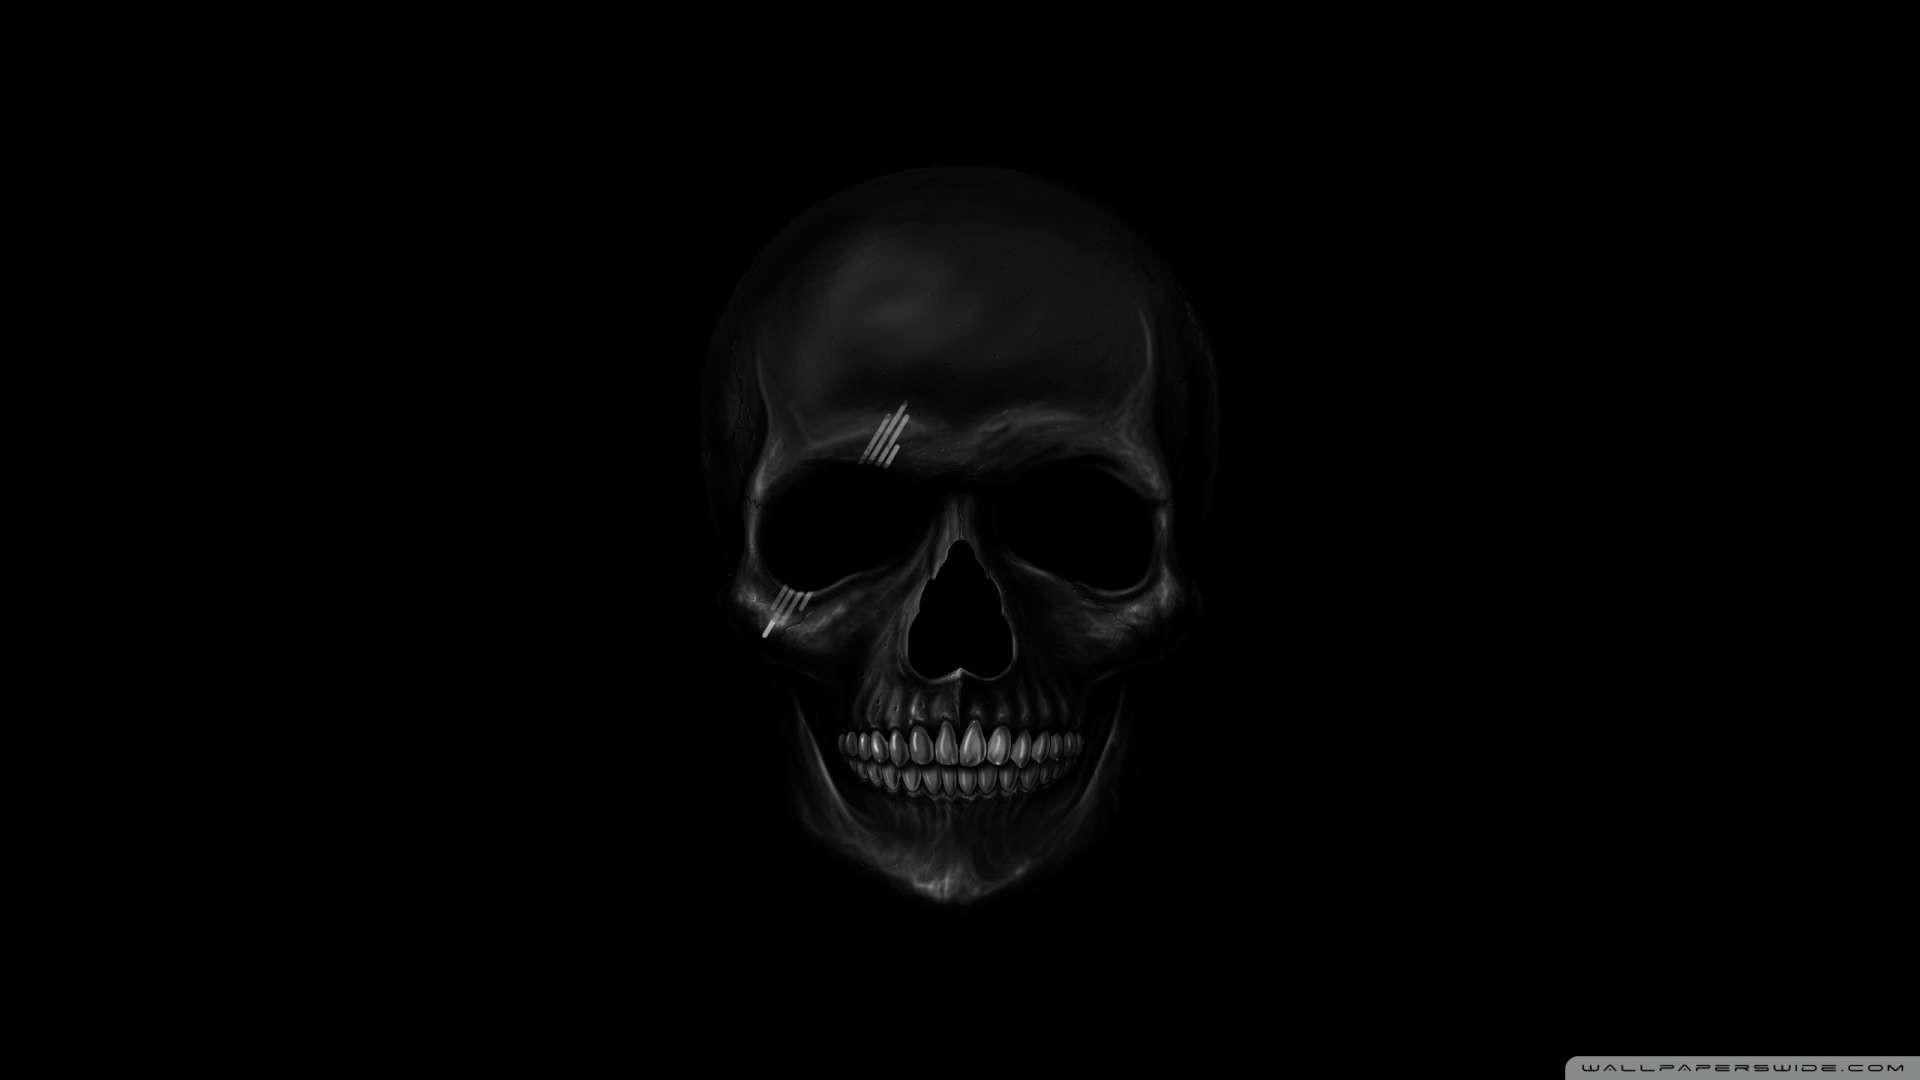 1920x1080 Wallpaper: Black Skull Wallpaper 1080p HD. Upload at February 12, 2014 .